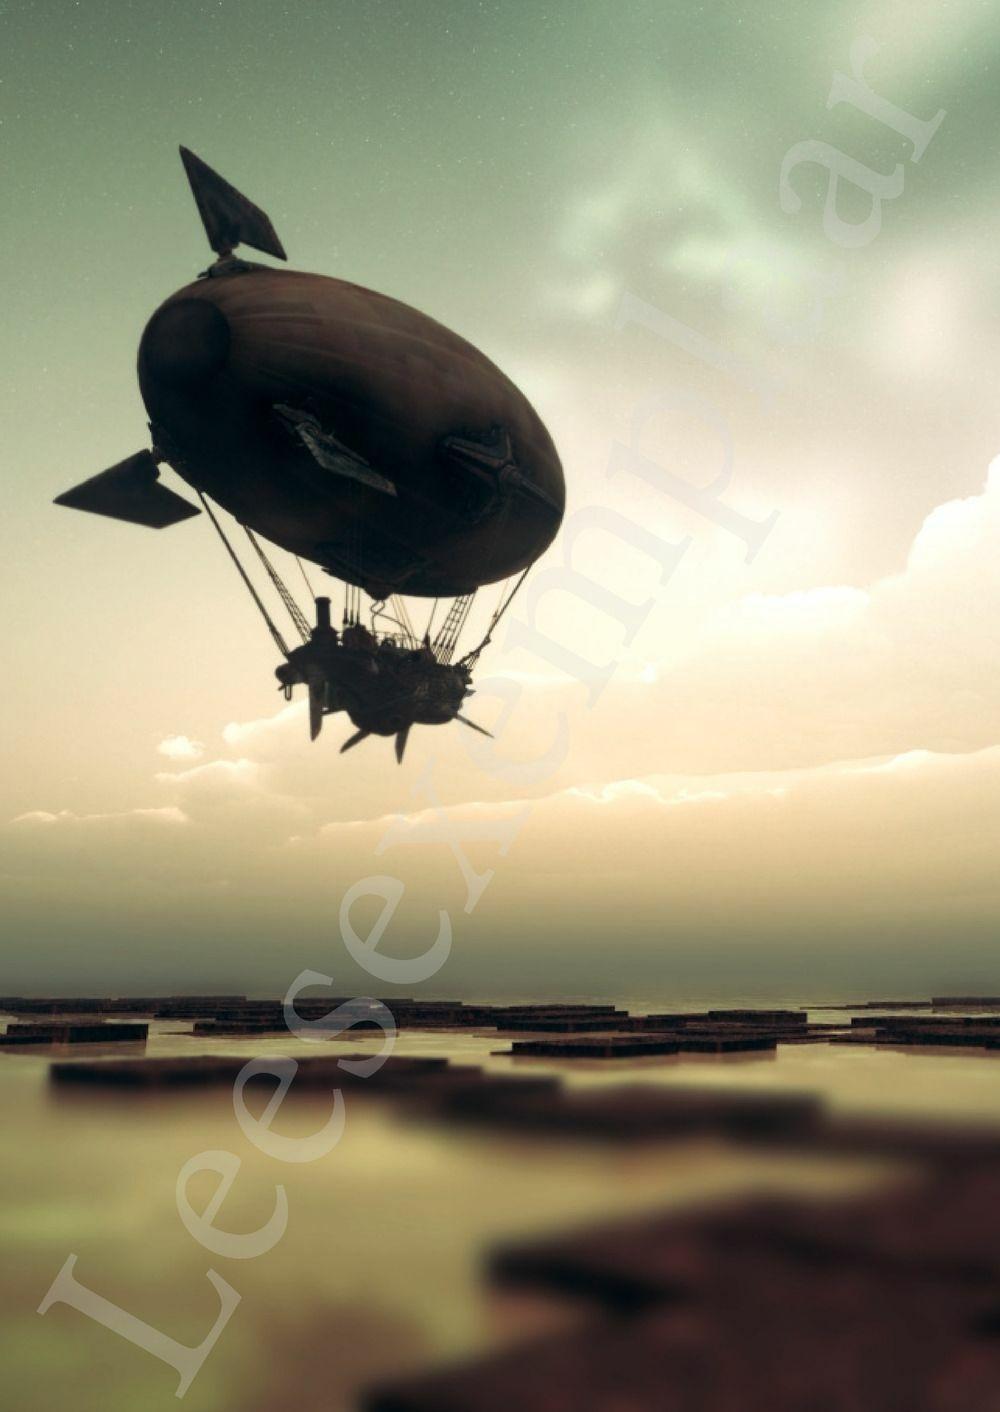 Preview: De kleine zeppelin